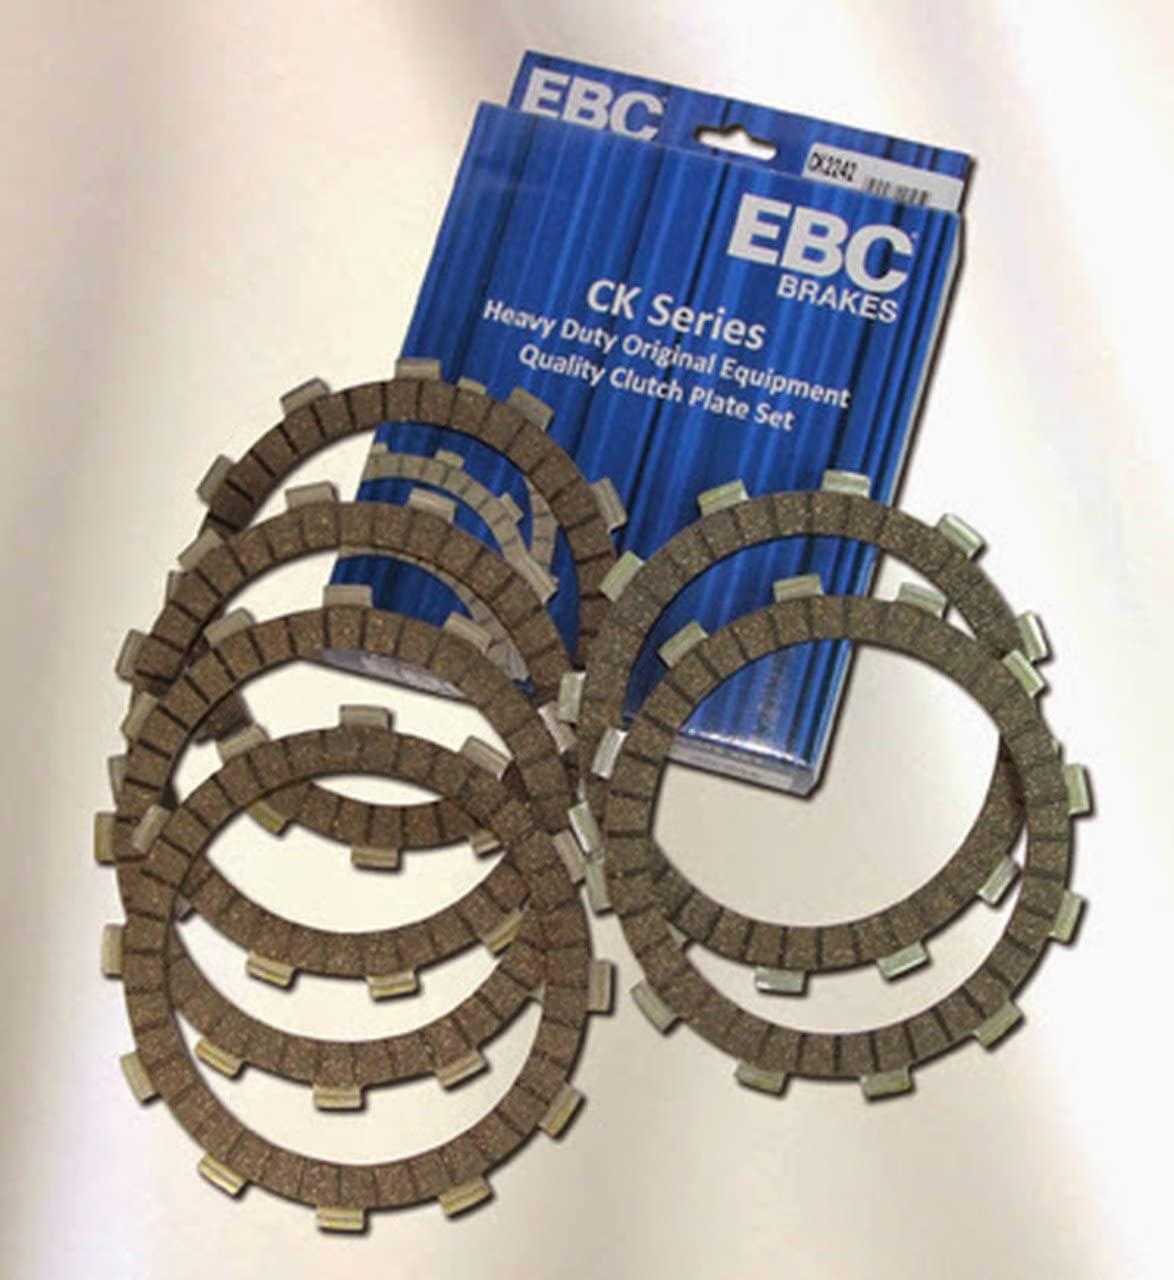 EBC Brakes CK3344 Clutch Friction Plate Kit